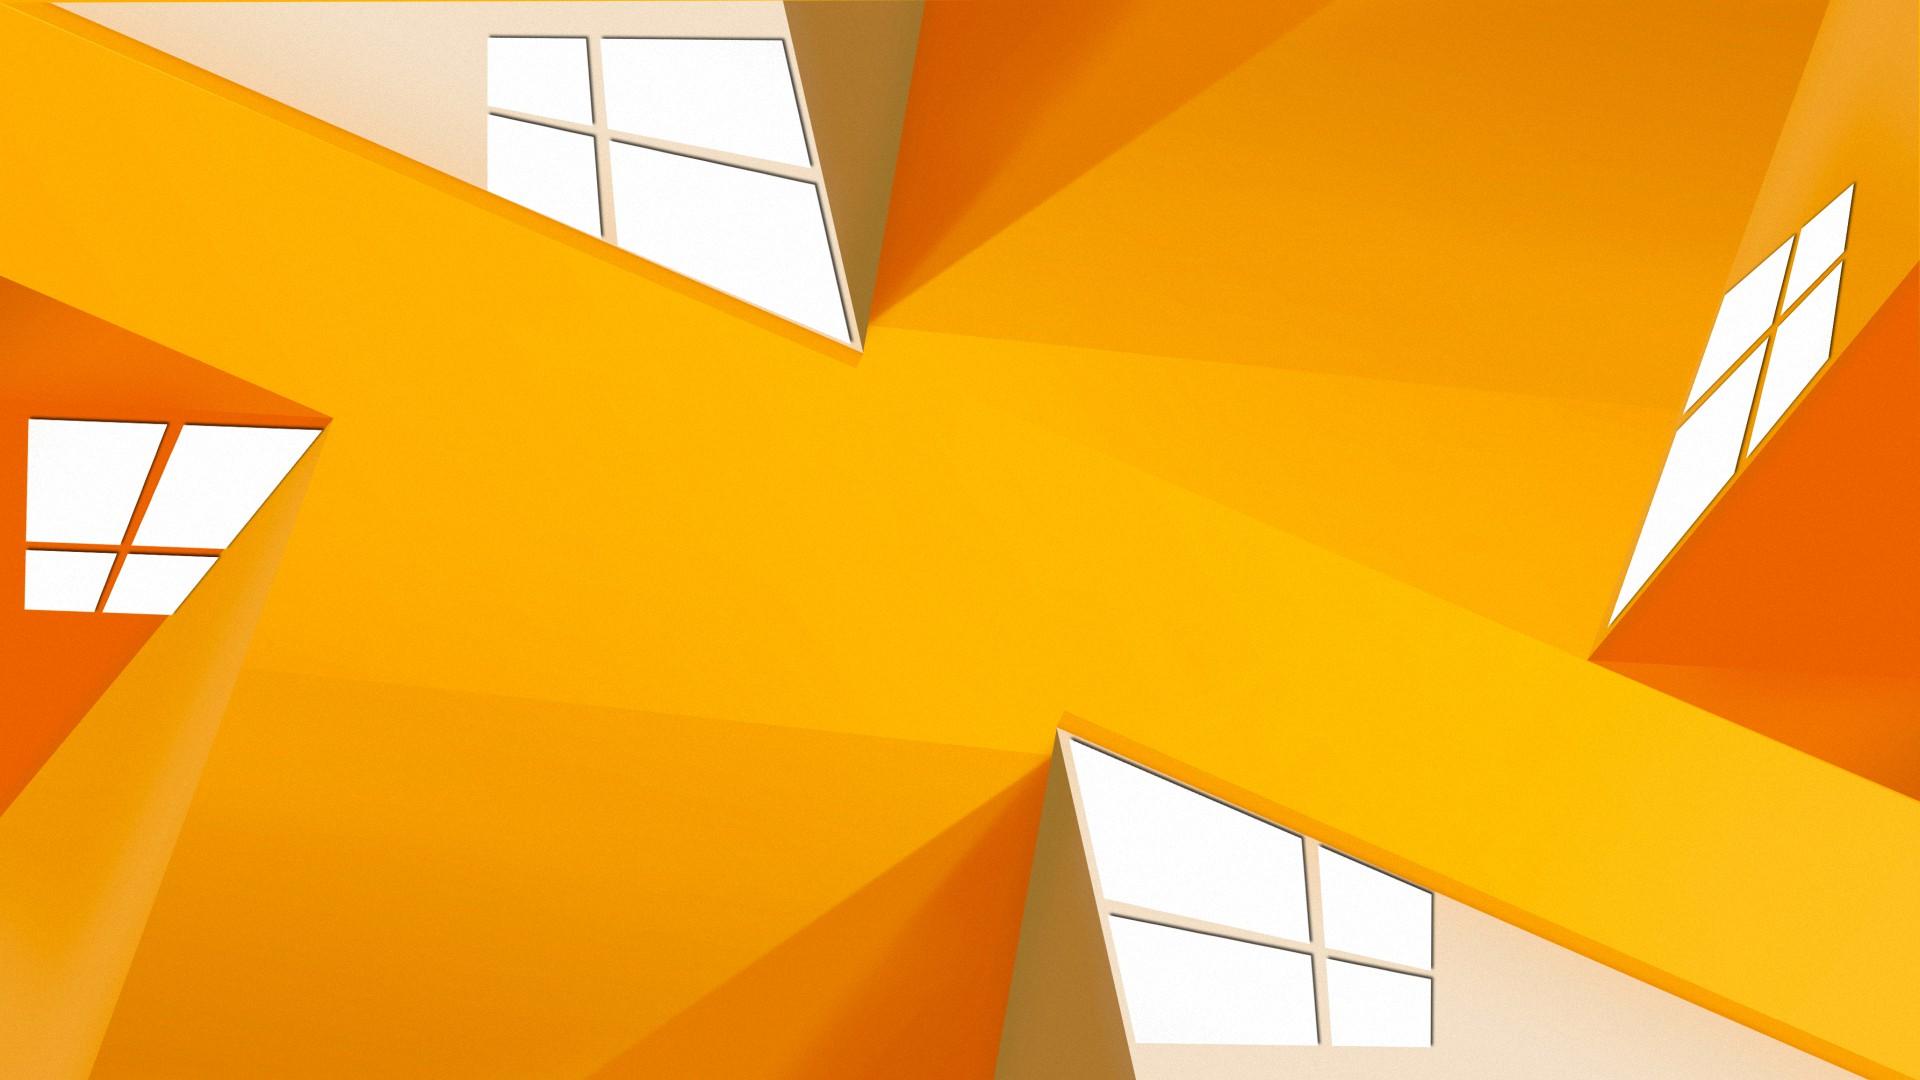 wallpaper official windows 8 1 02 by zeanoel on deviantart